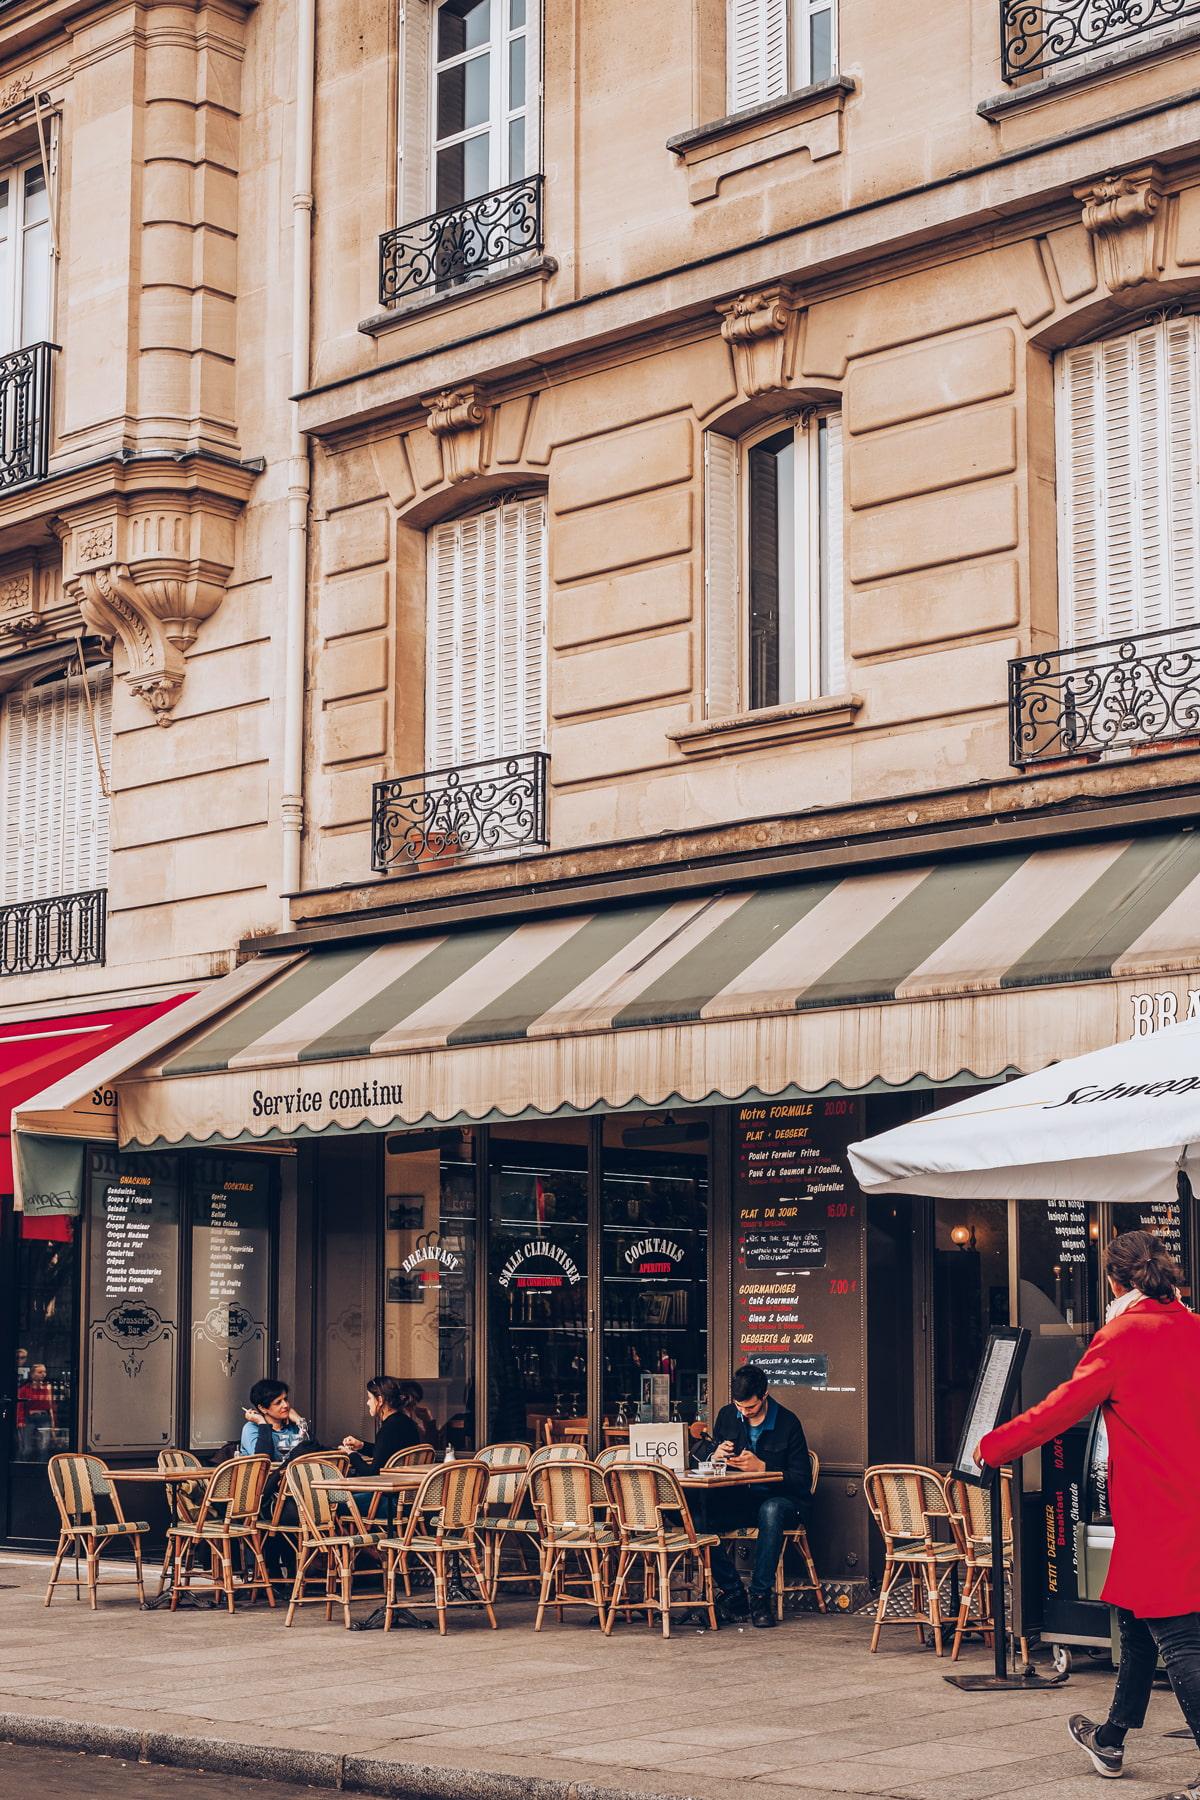 Parisian cafe with terrace